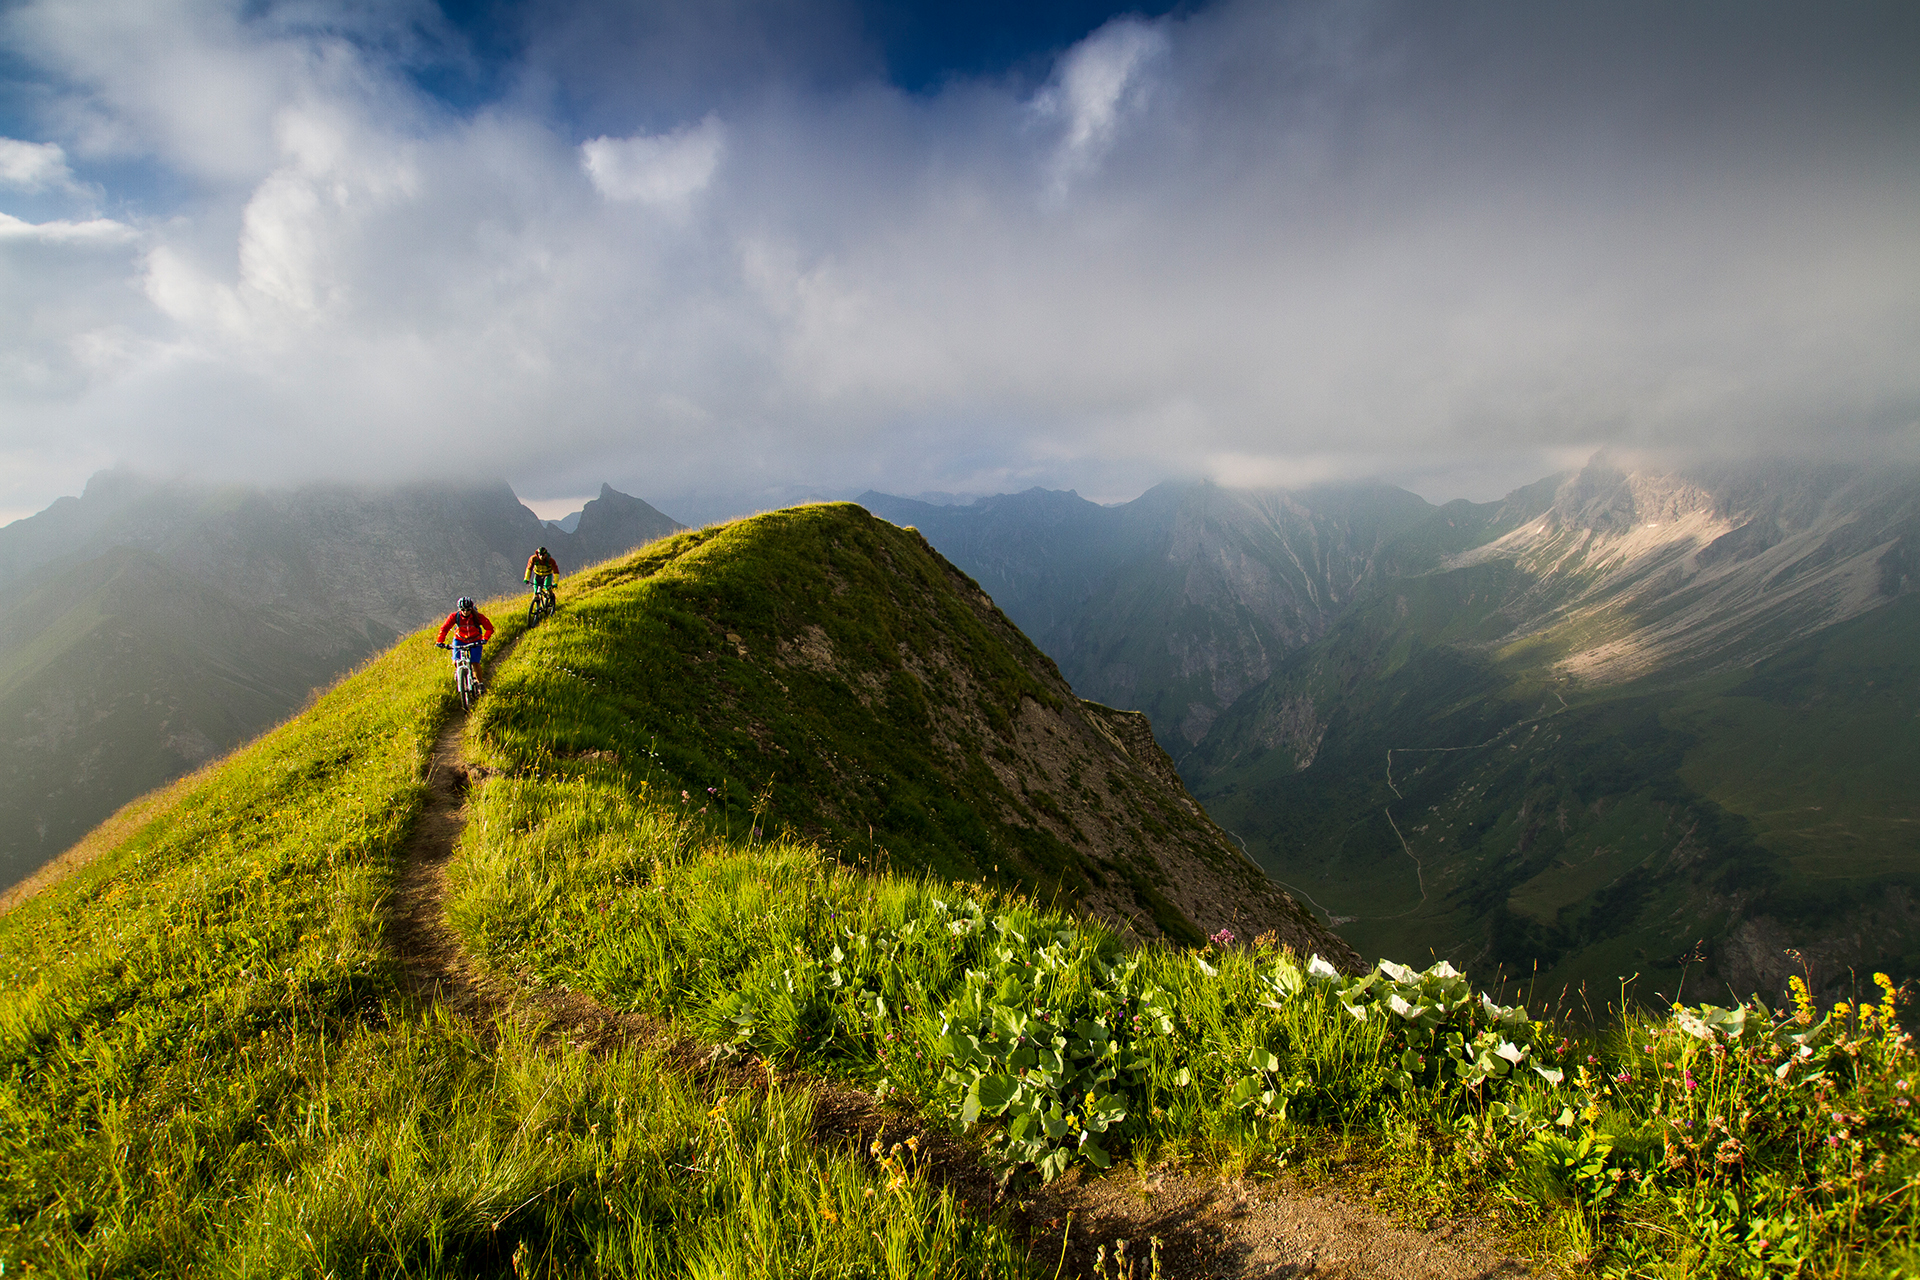 VAUDE-Visions-Wallpapers-for-free-Bastian-Morell-MTBiking-Allgaue-Alps-wallpaper-wp48011700